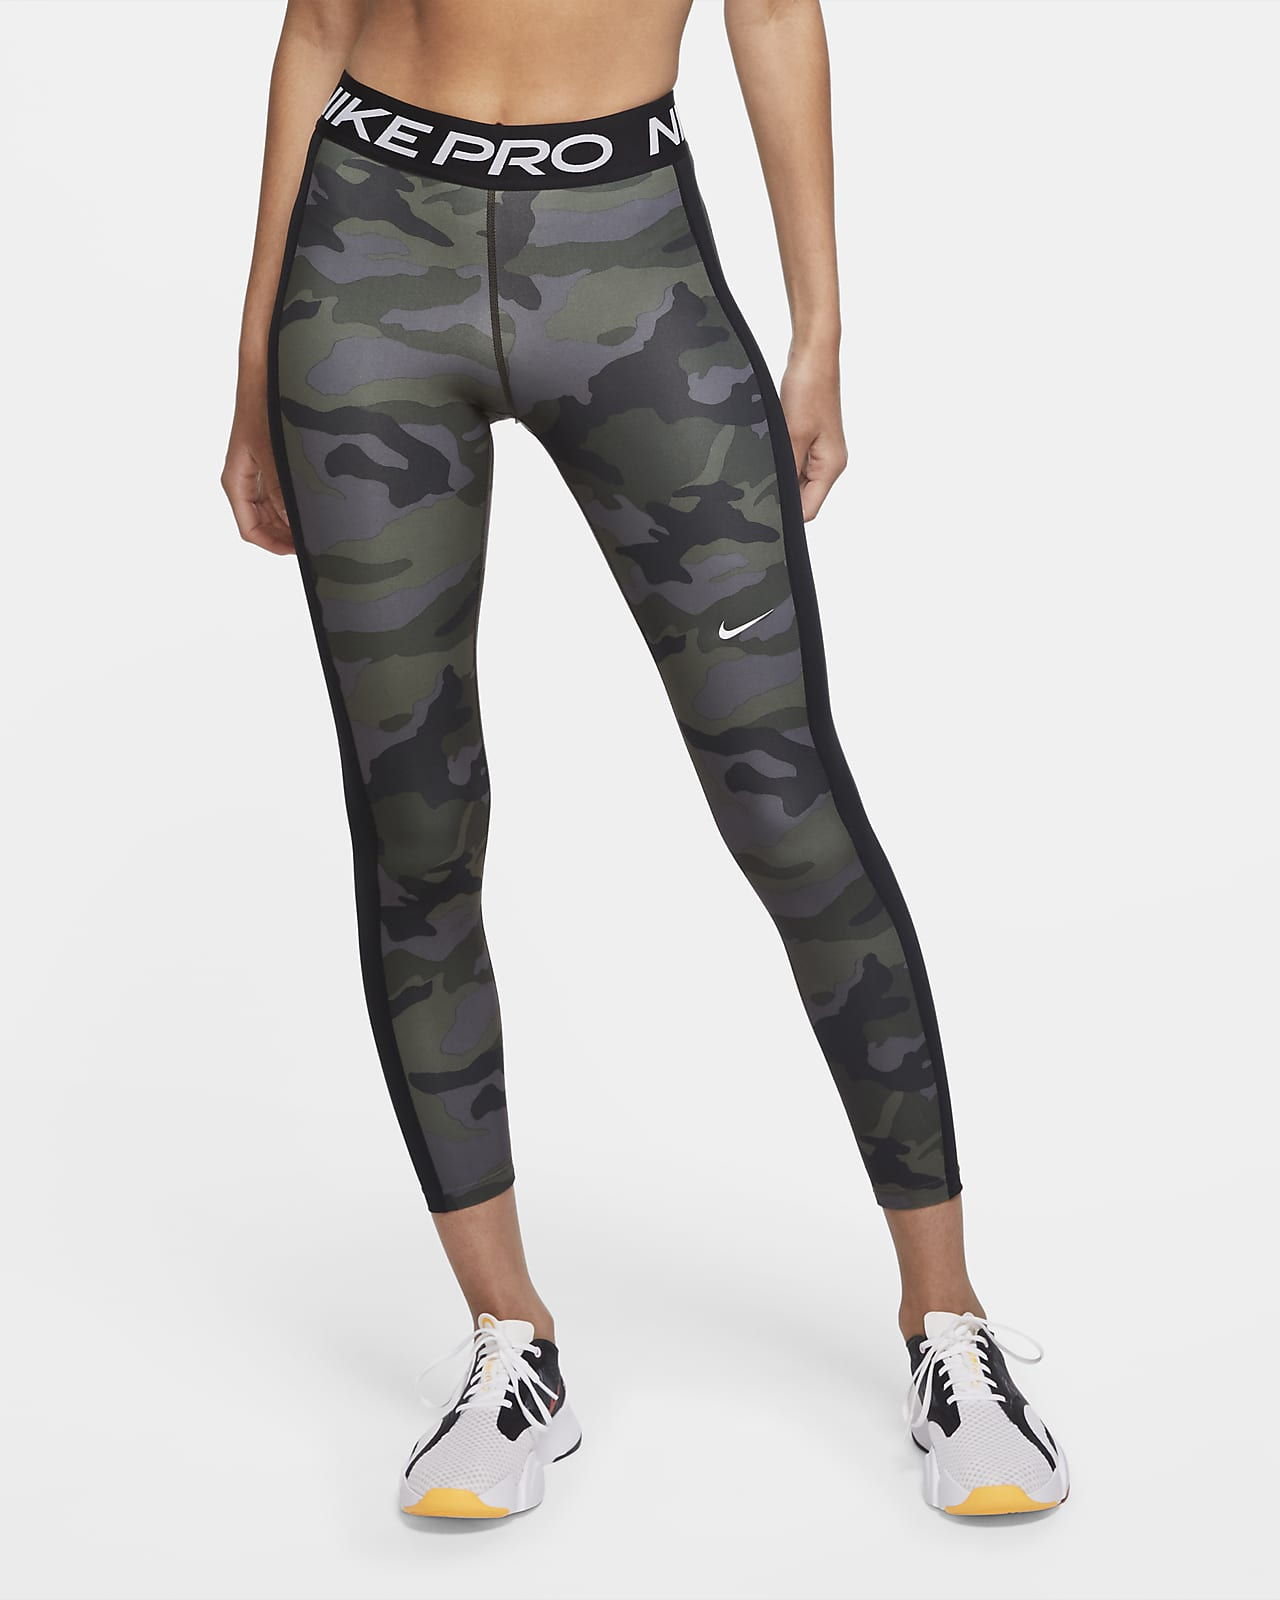 Legging camouflage 7/8 Nike Pro pour Femme